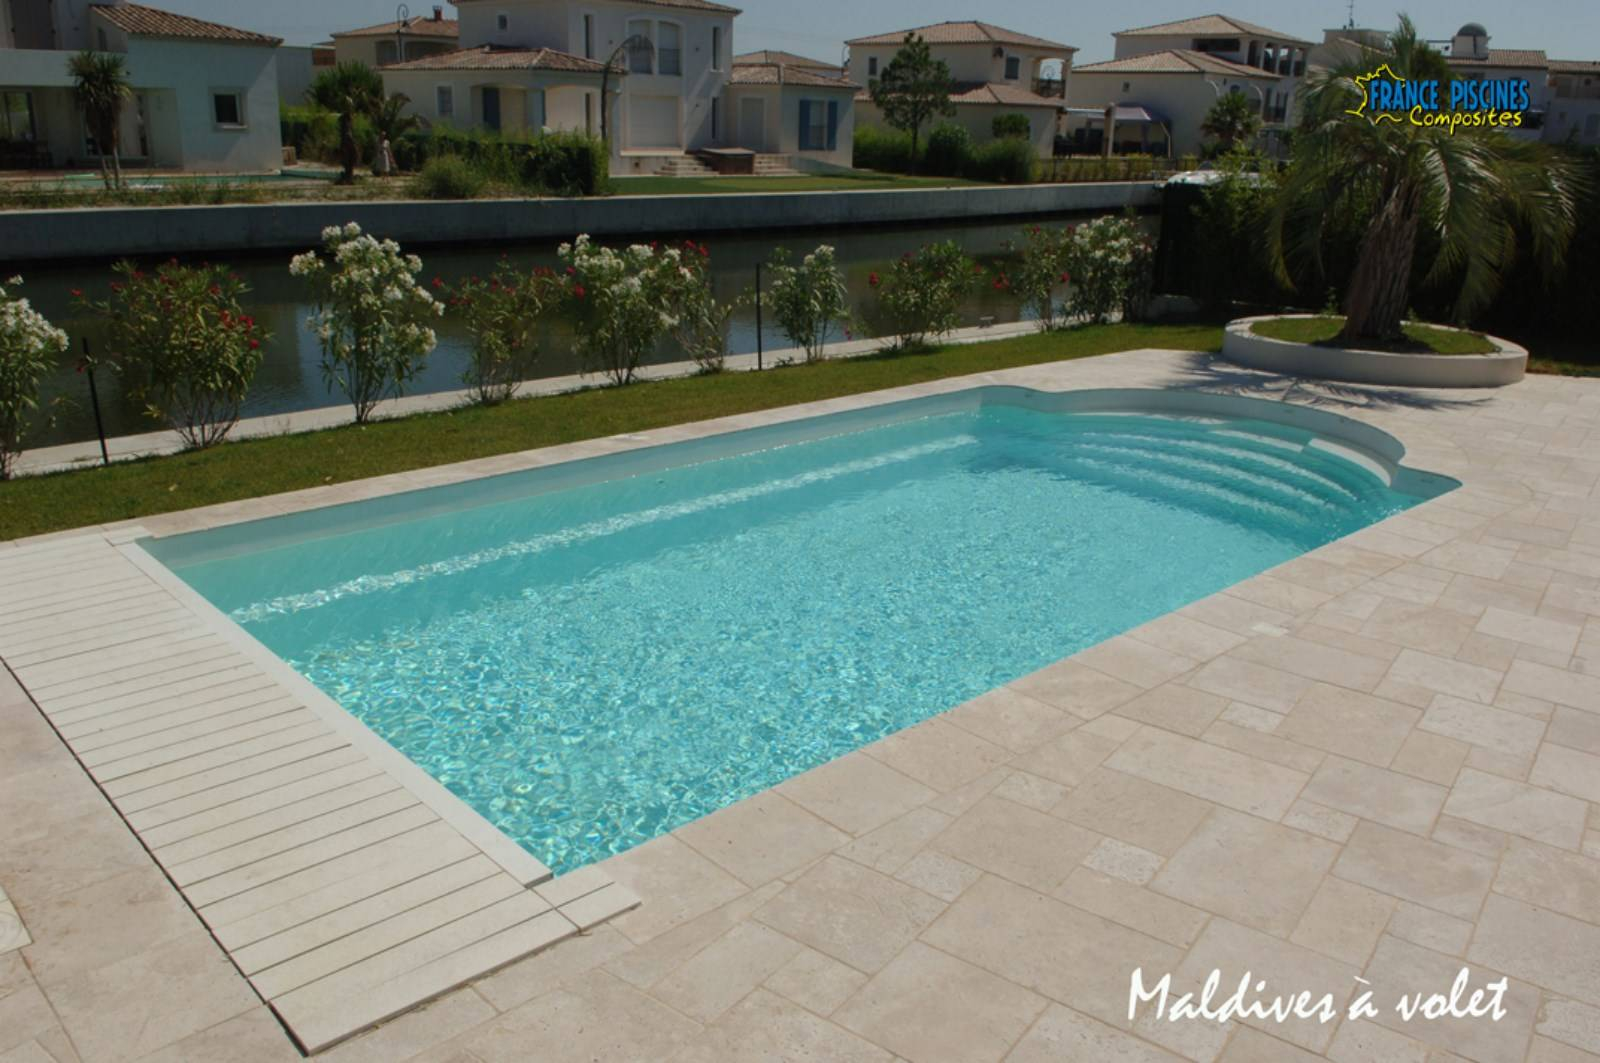 Prix tout pris d une piscine coque polyester 9X4 design